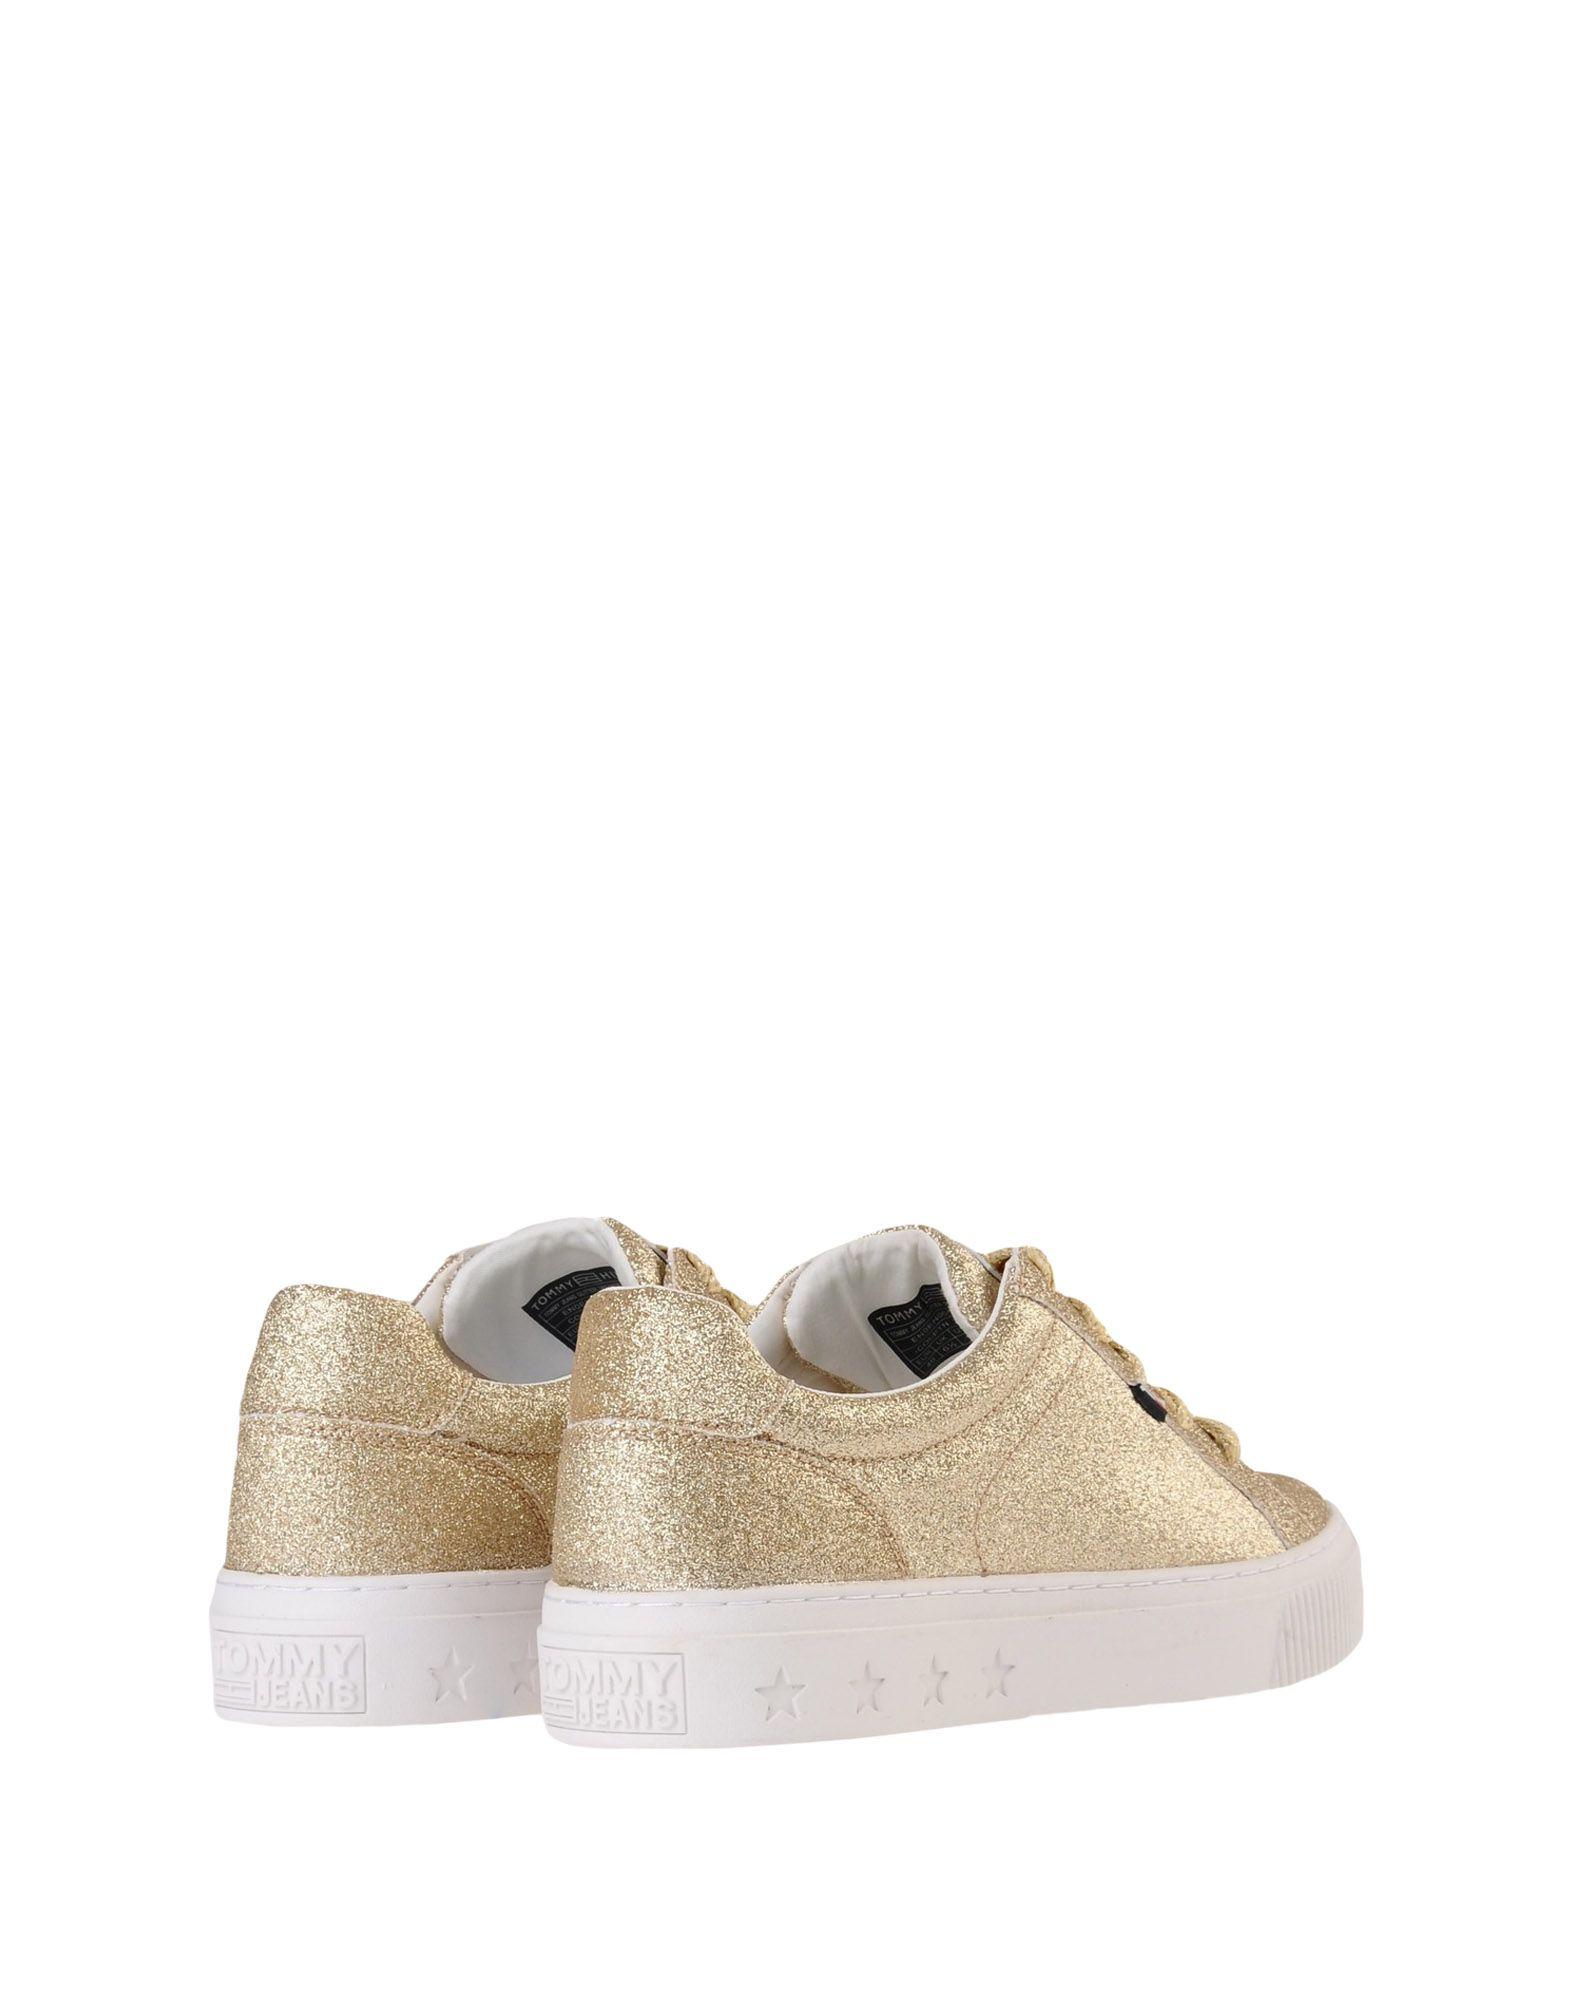 Tommy Jeans Tommy Jeans Glitter Sneaker  Schuhe 11470986OD Gute Qualität beliebte Schuhe  750215